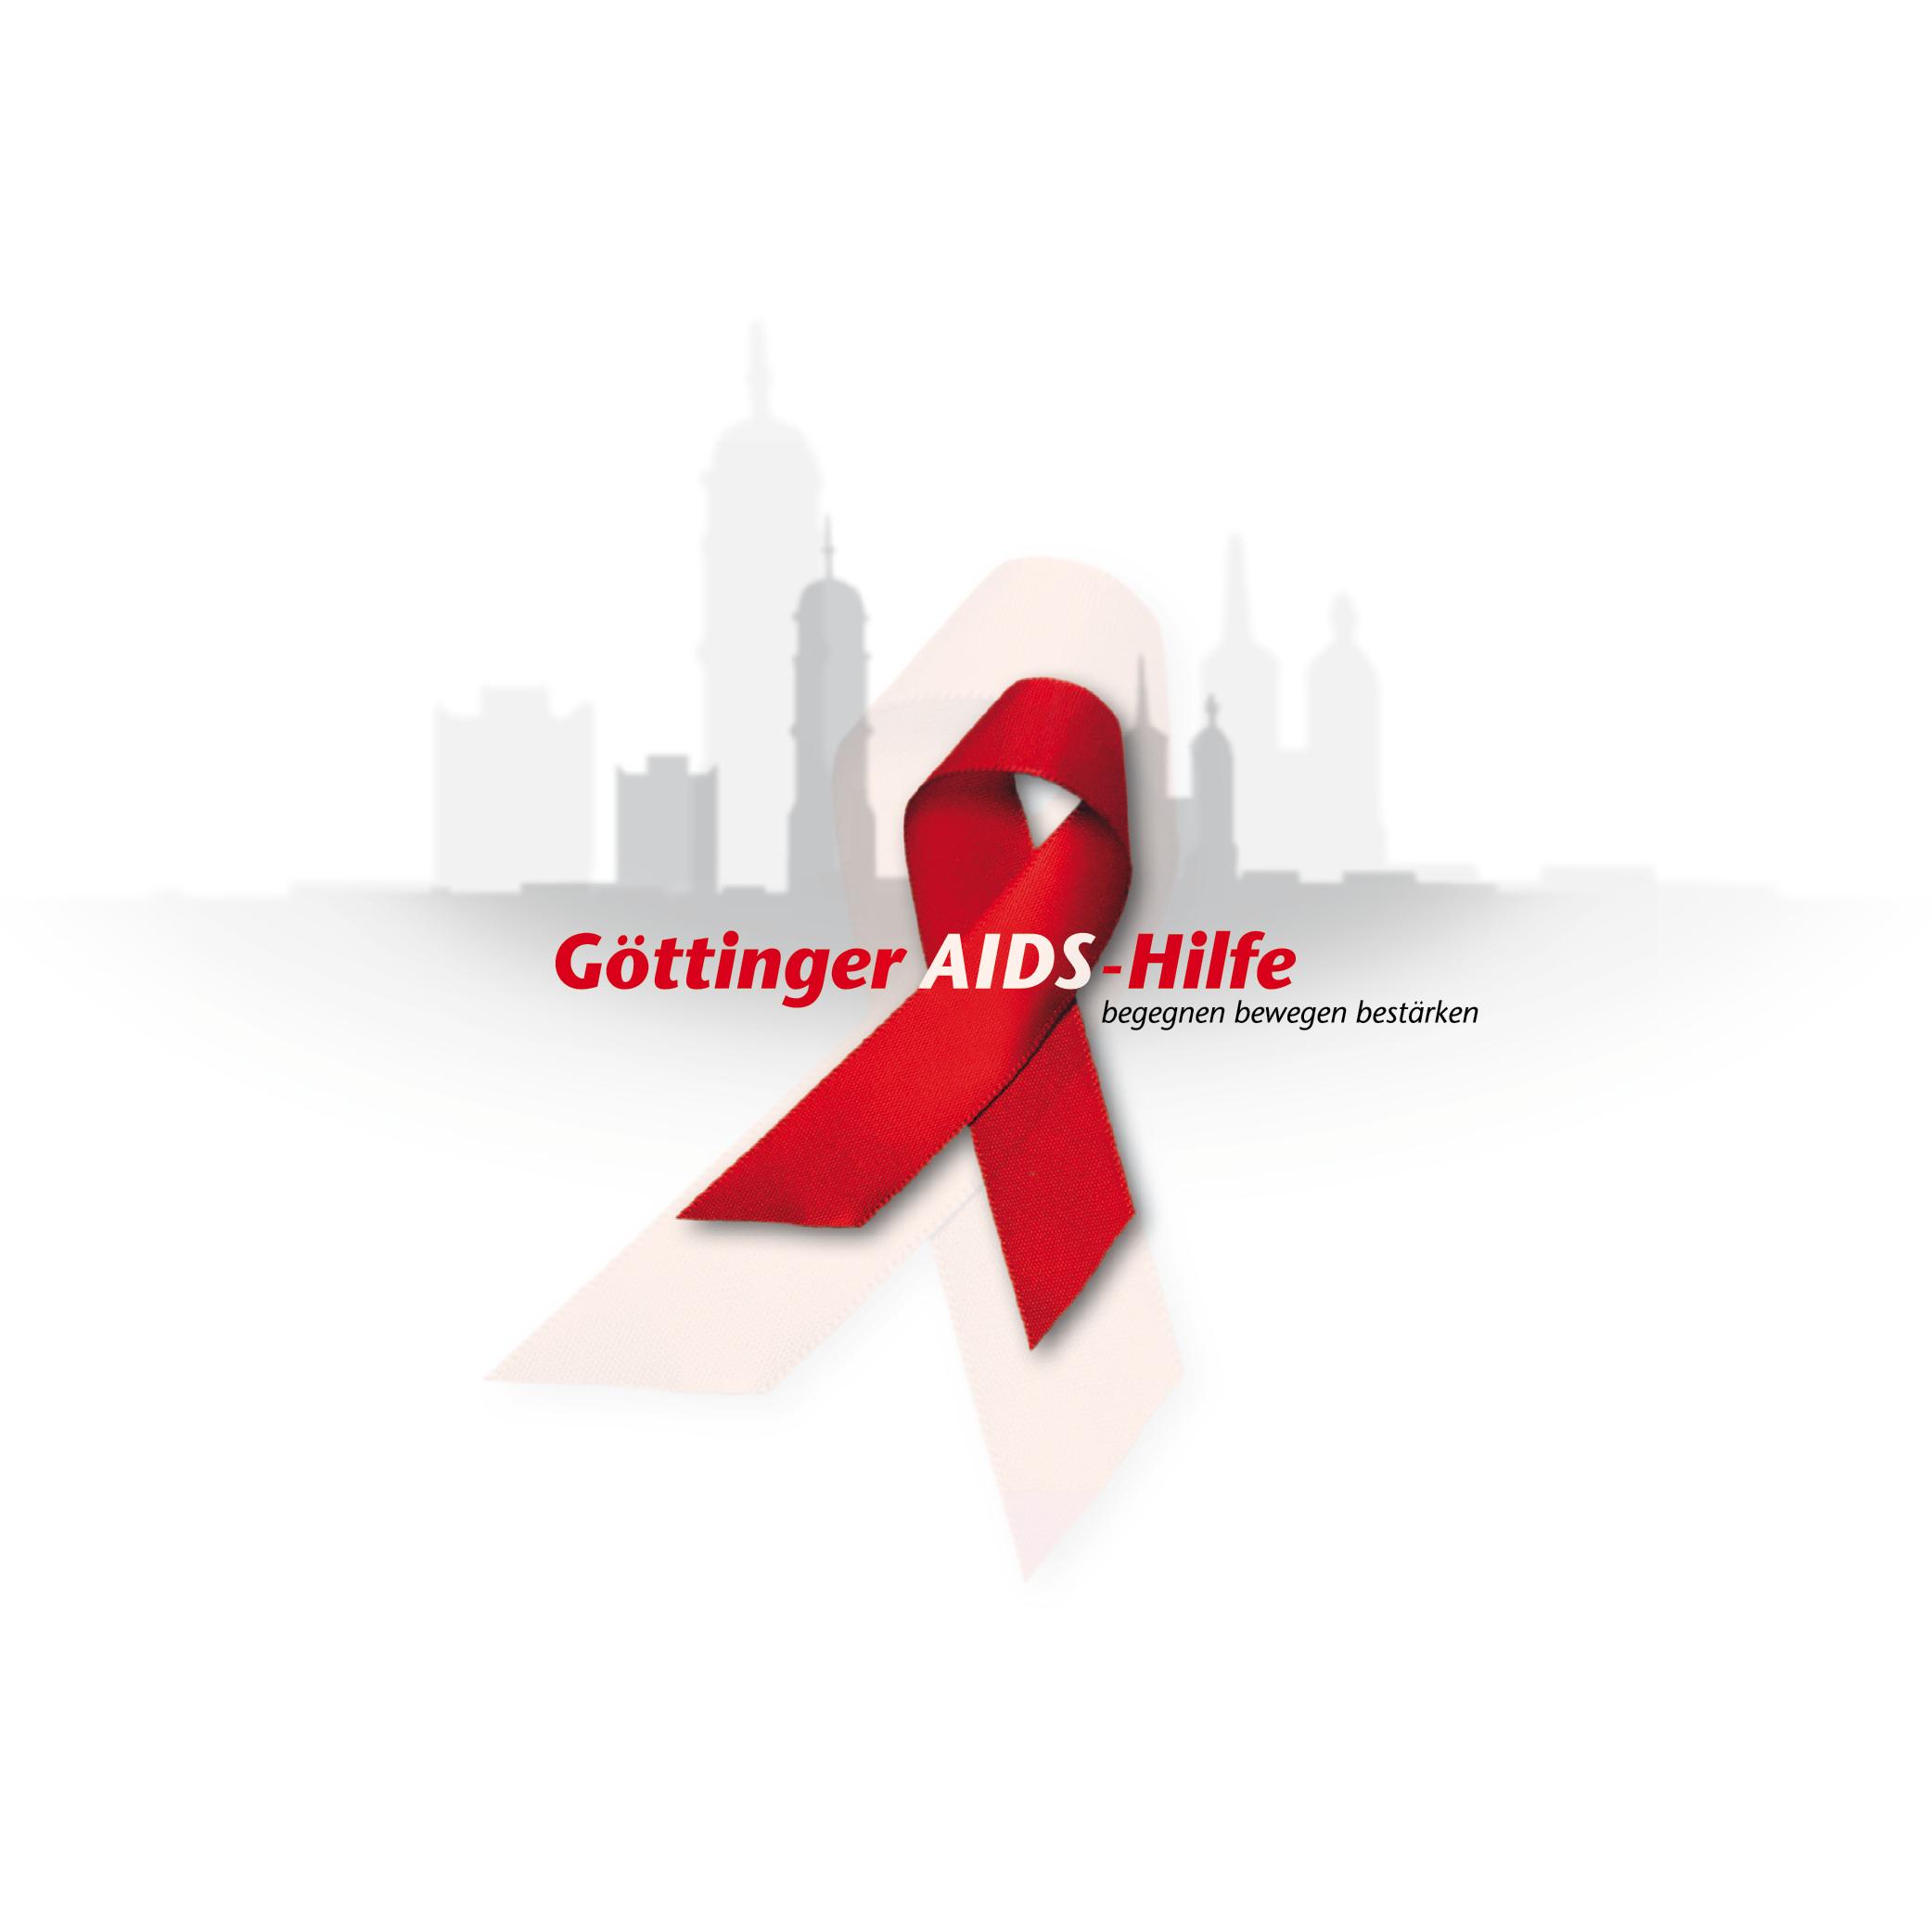 AIDS-Hilfe Göttingen, Wort-Bildmarke